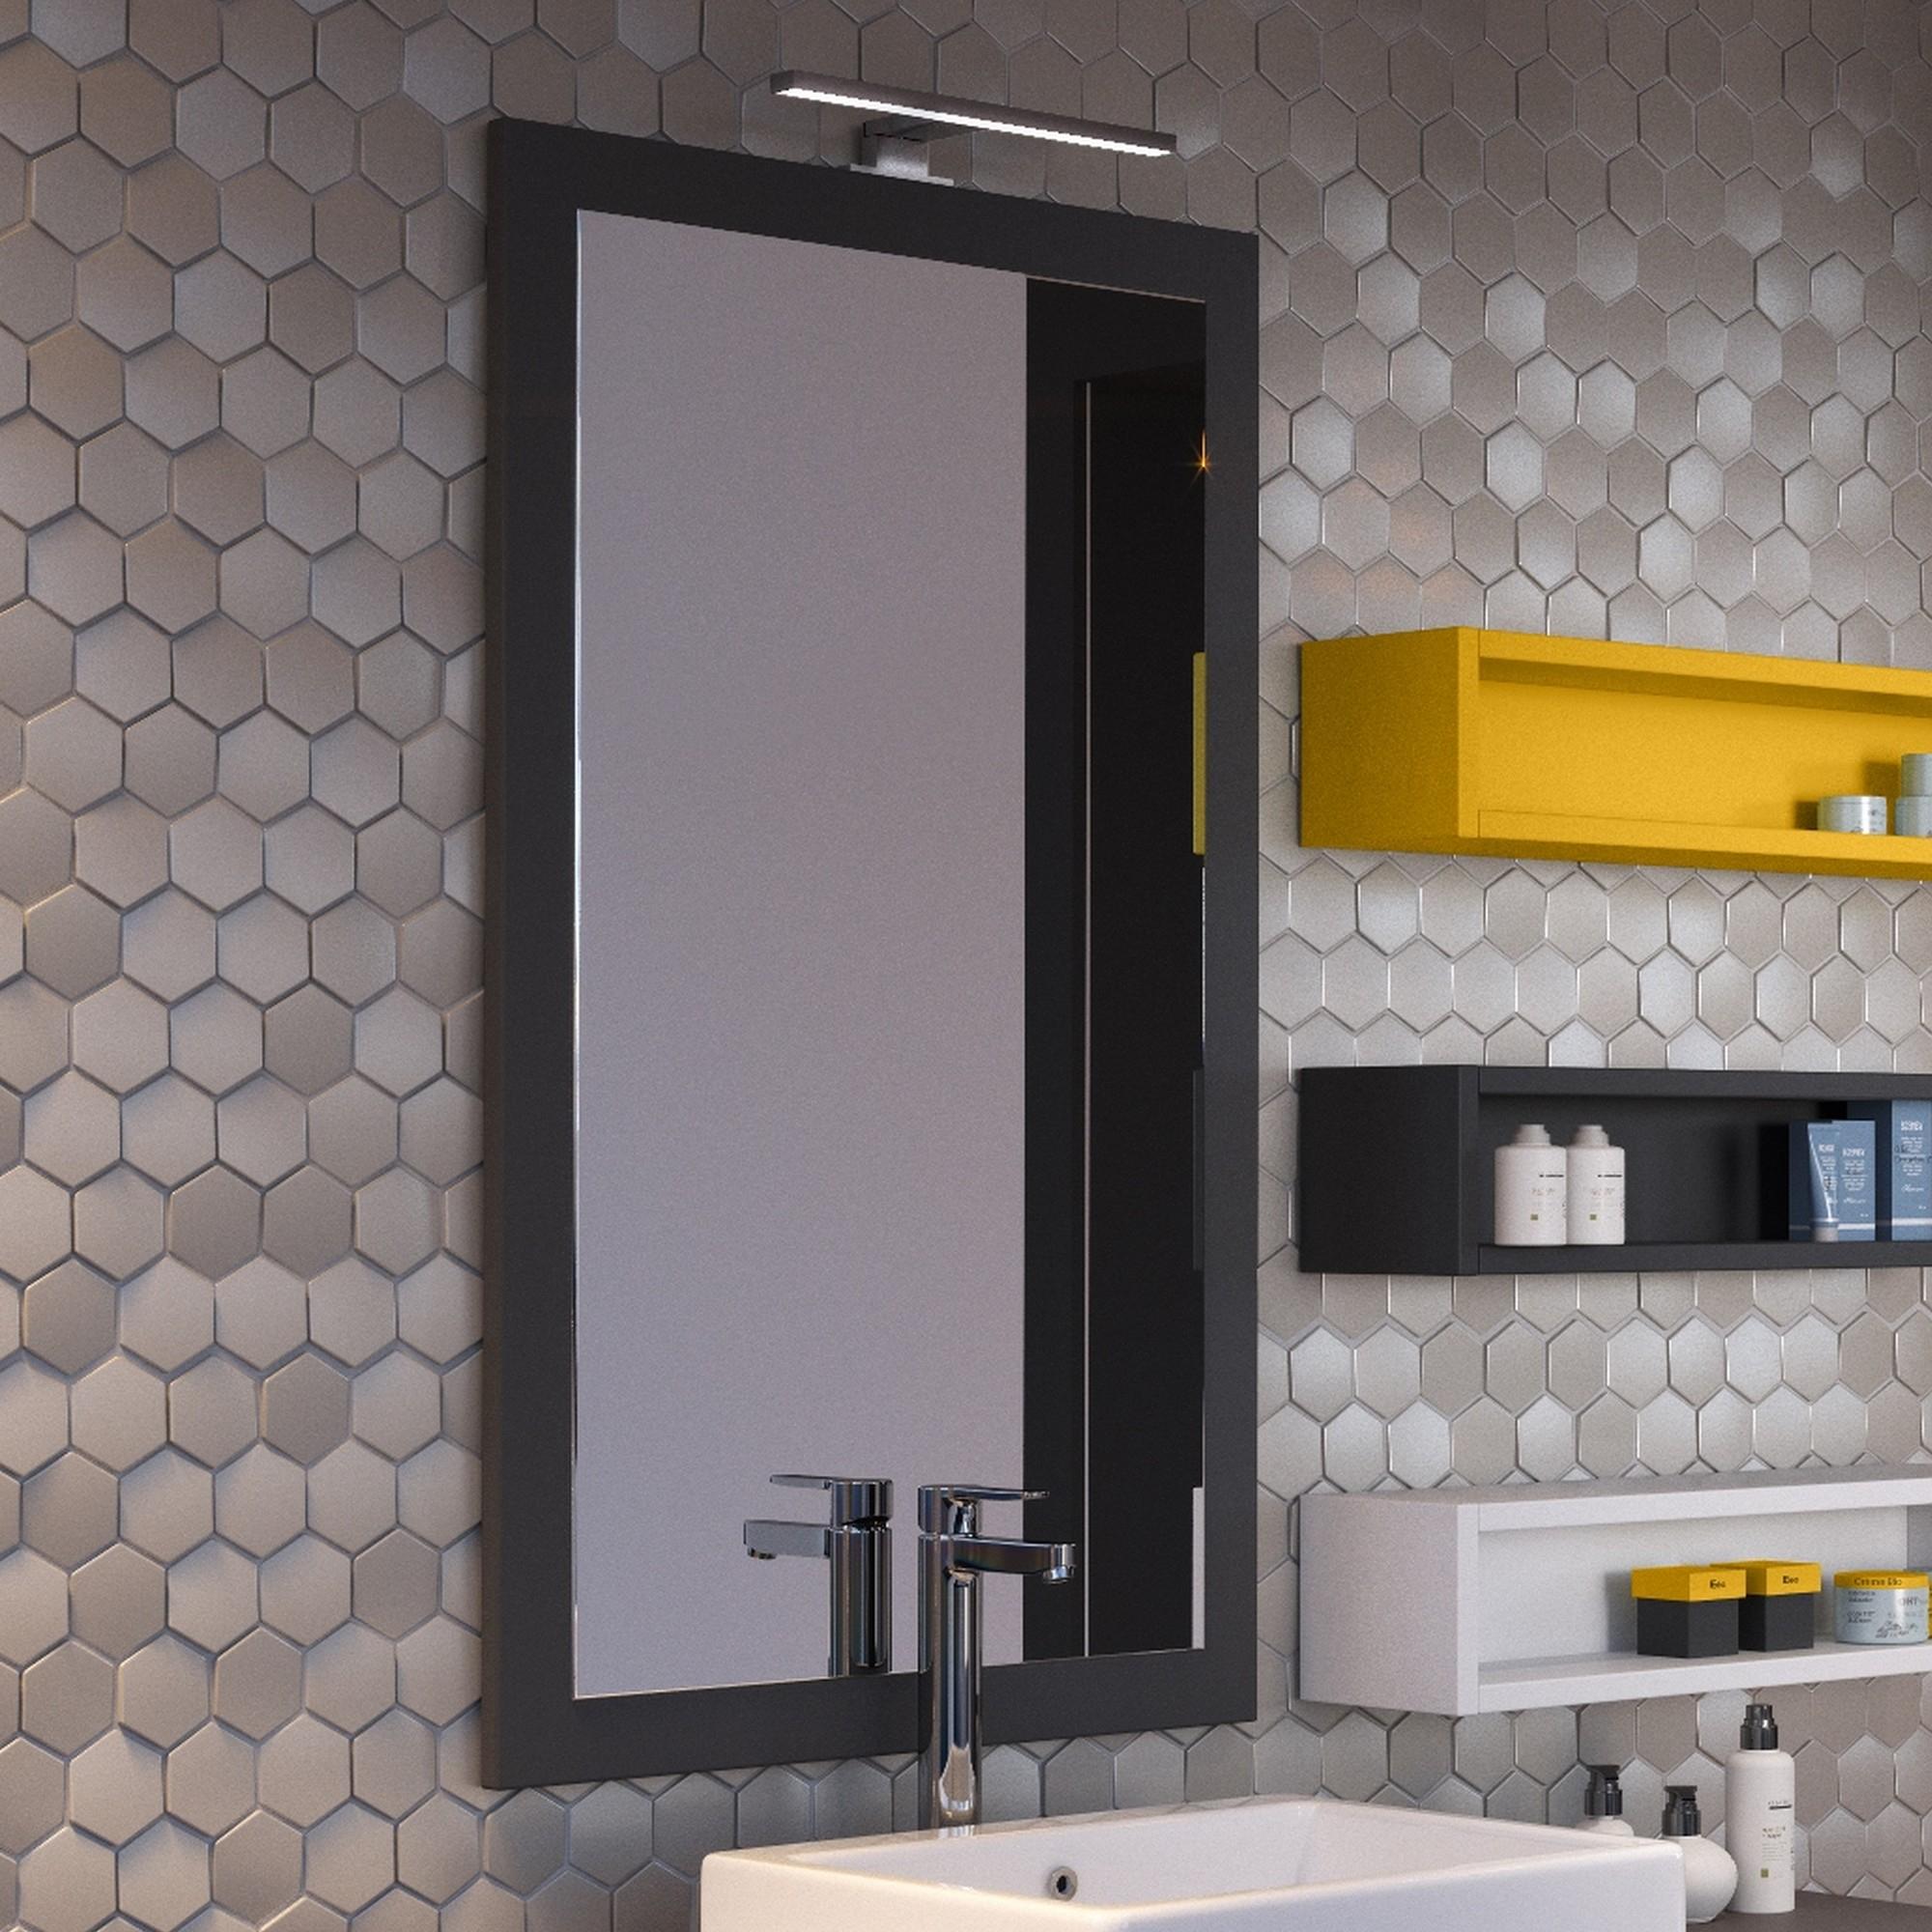 Miroir Led Salle De Bain Noir - Miroir Lumineux Pour Salle pour Mirroir Salle De Bain